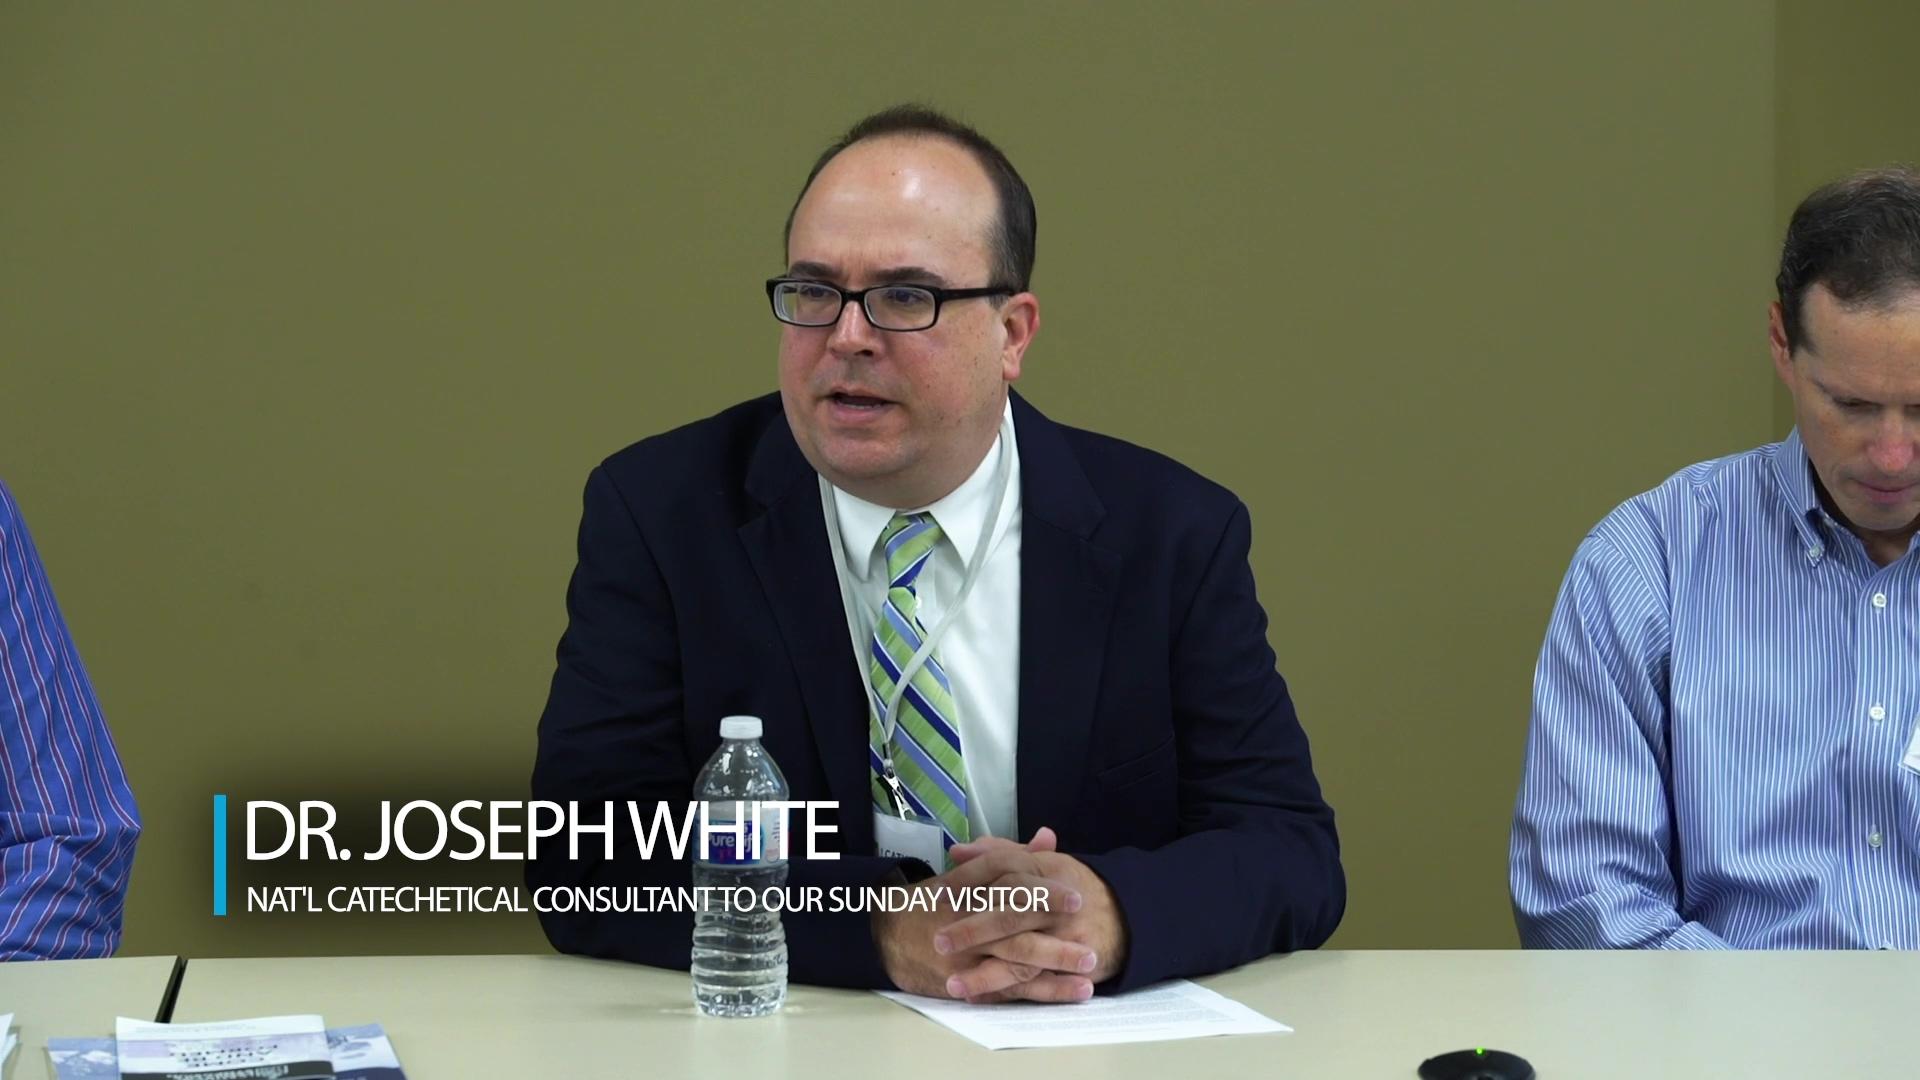 Dr. Joseph White